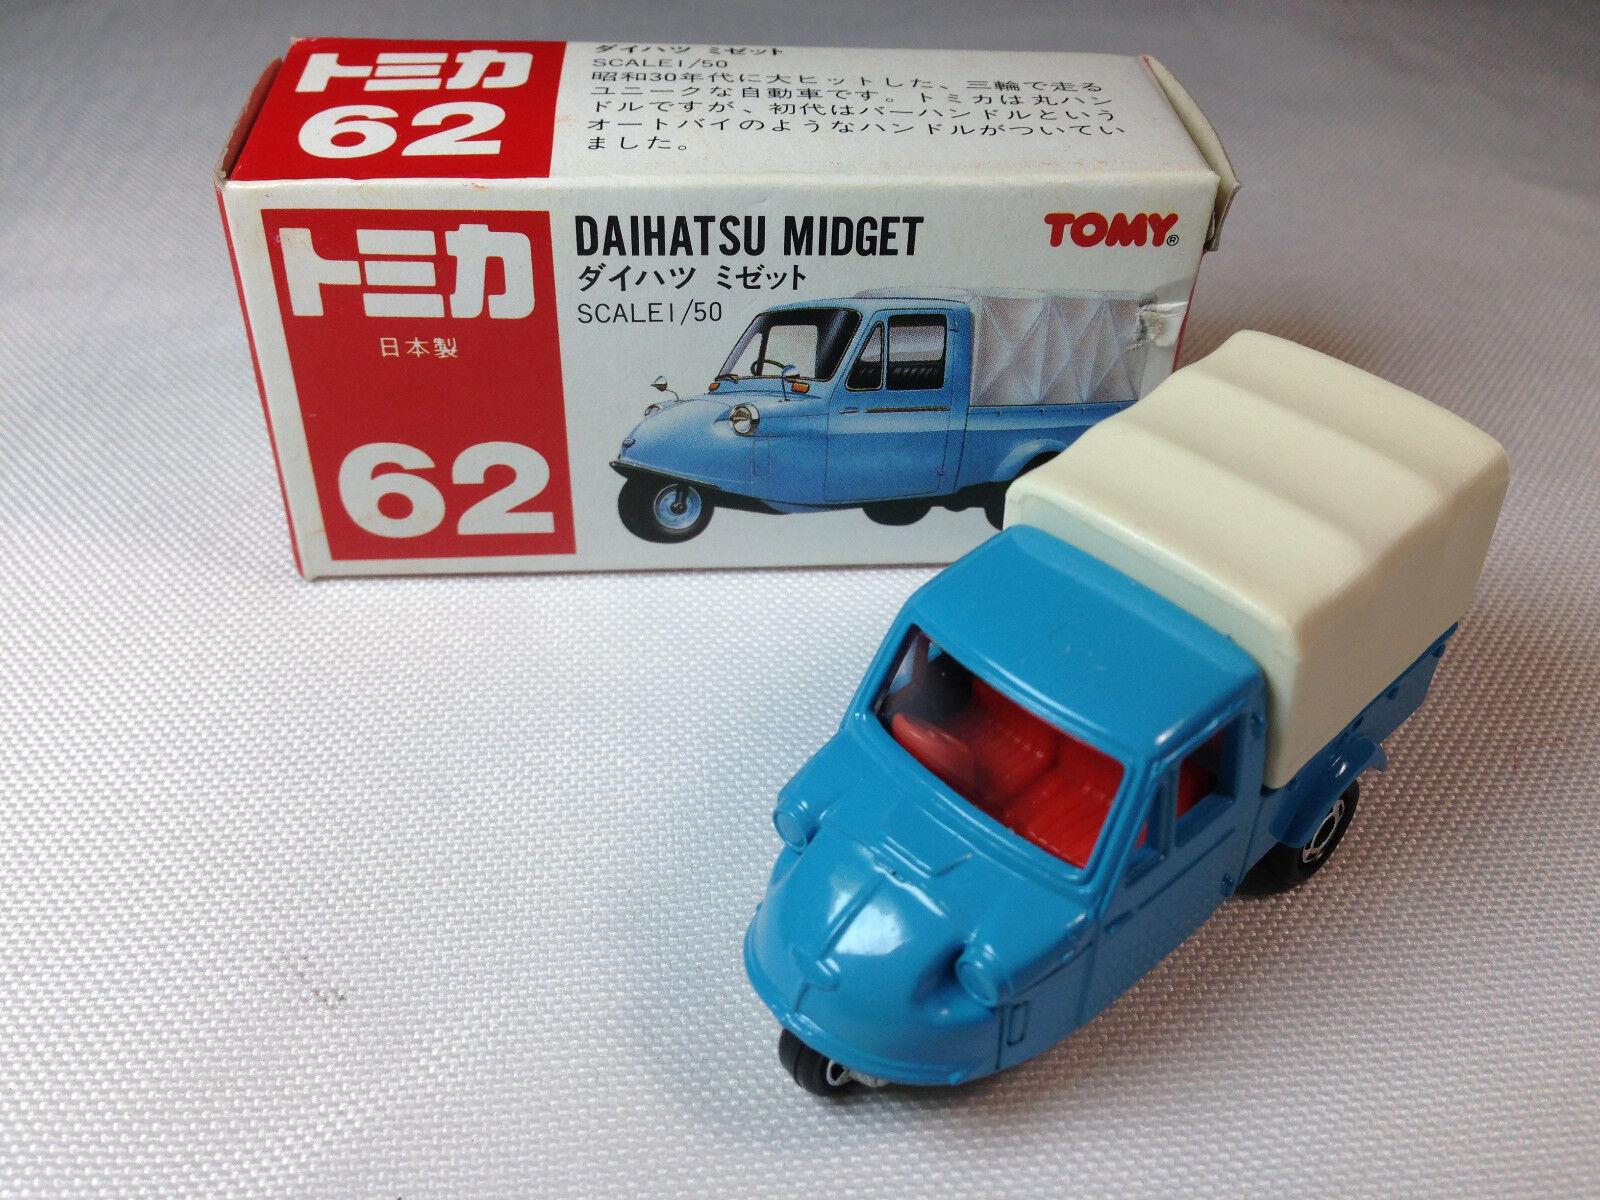 Tomy Tomica No. 62 Daihatsu Midget--1 50--Made in Japan--Collector's item.